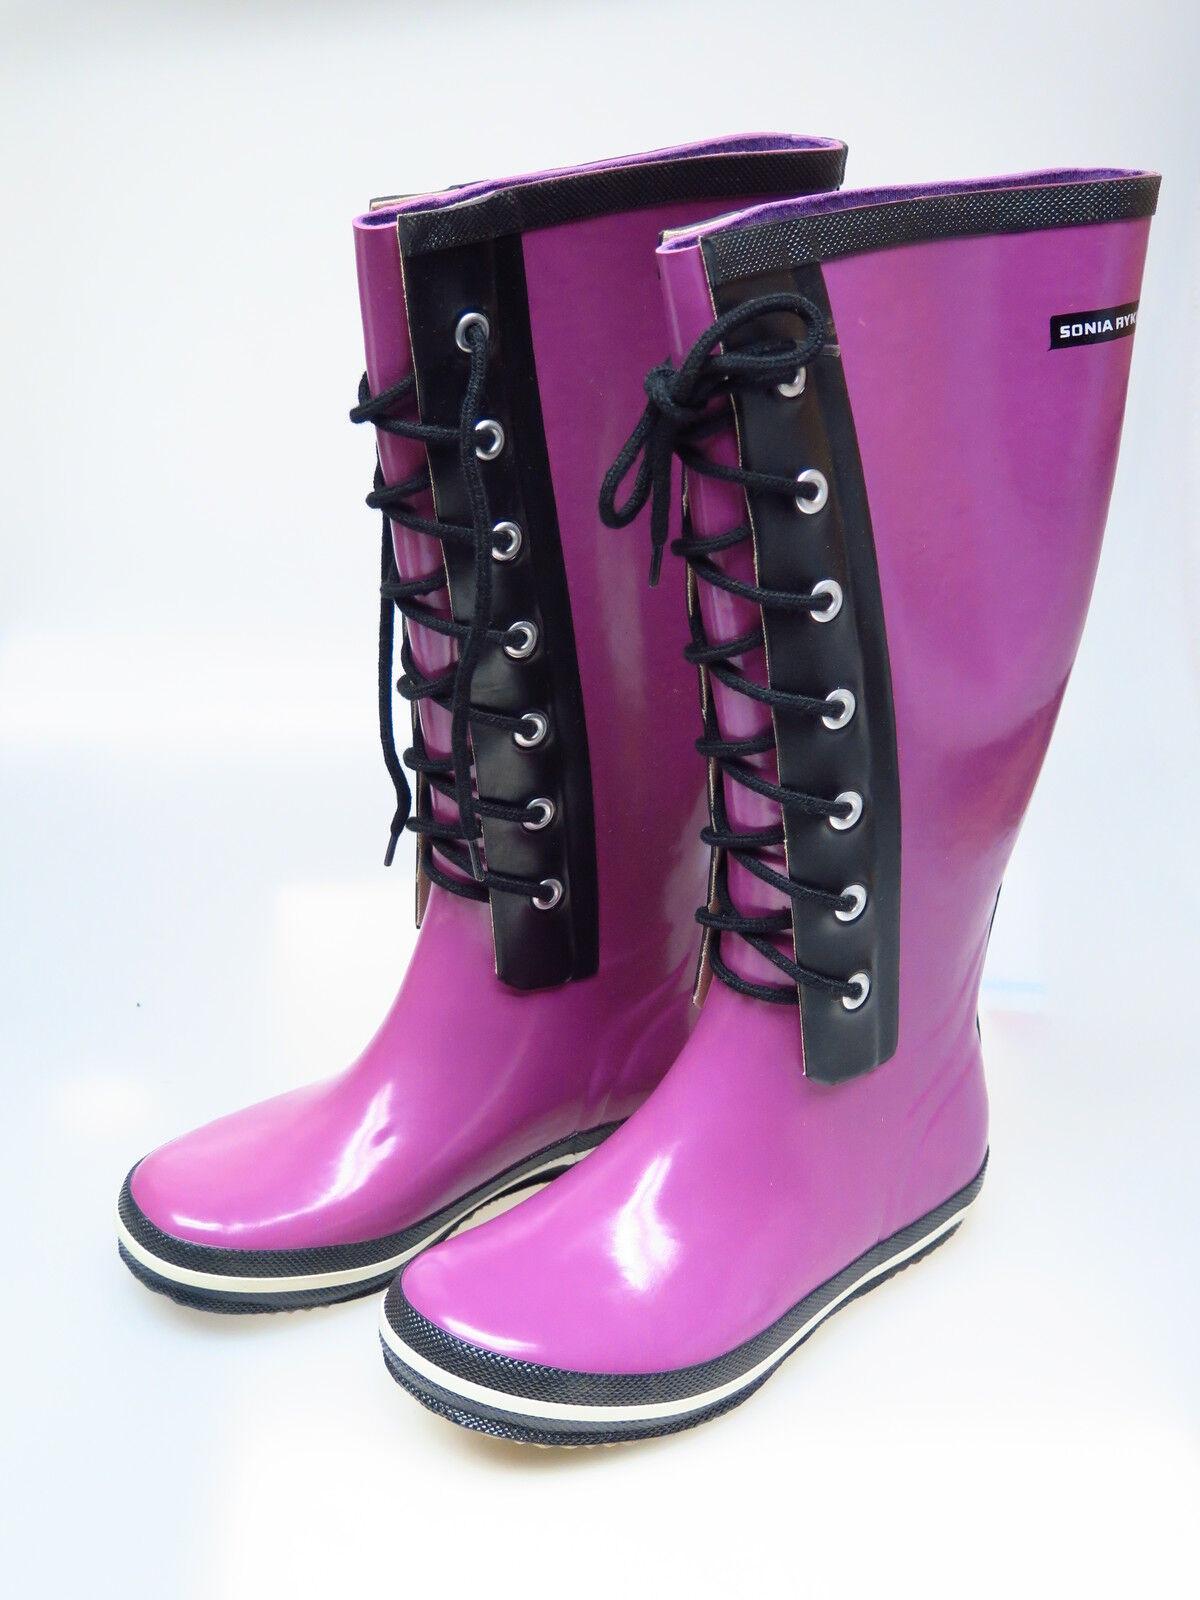 Sonia rykiel Chaussures Femmes Bottes Caoutchouc rose Myrtille taxi botte violet 37 NEUF